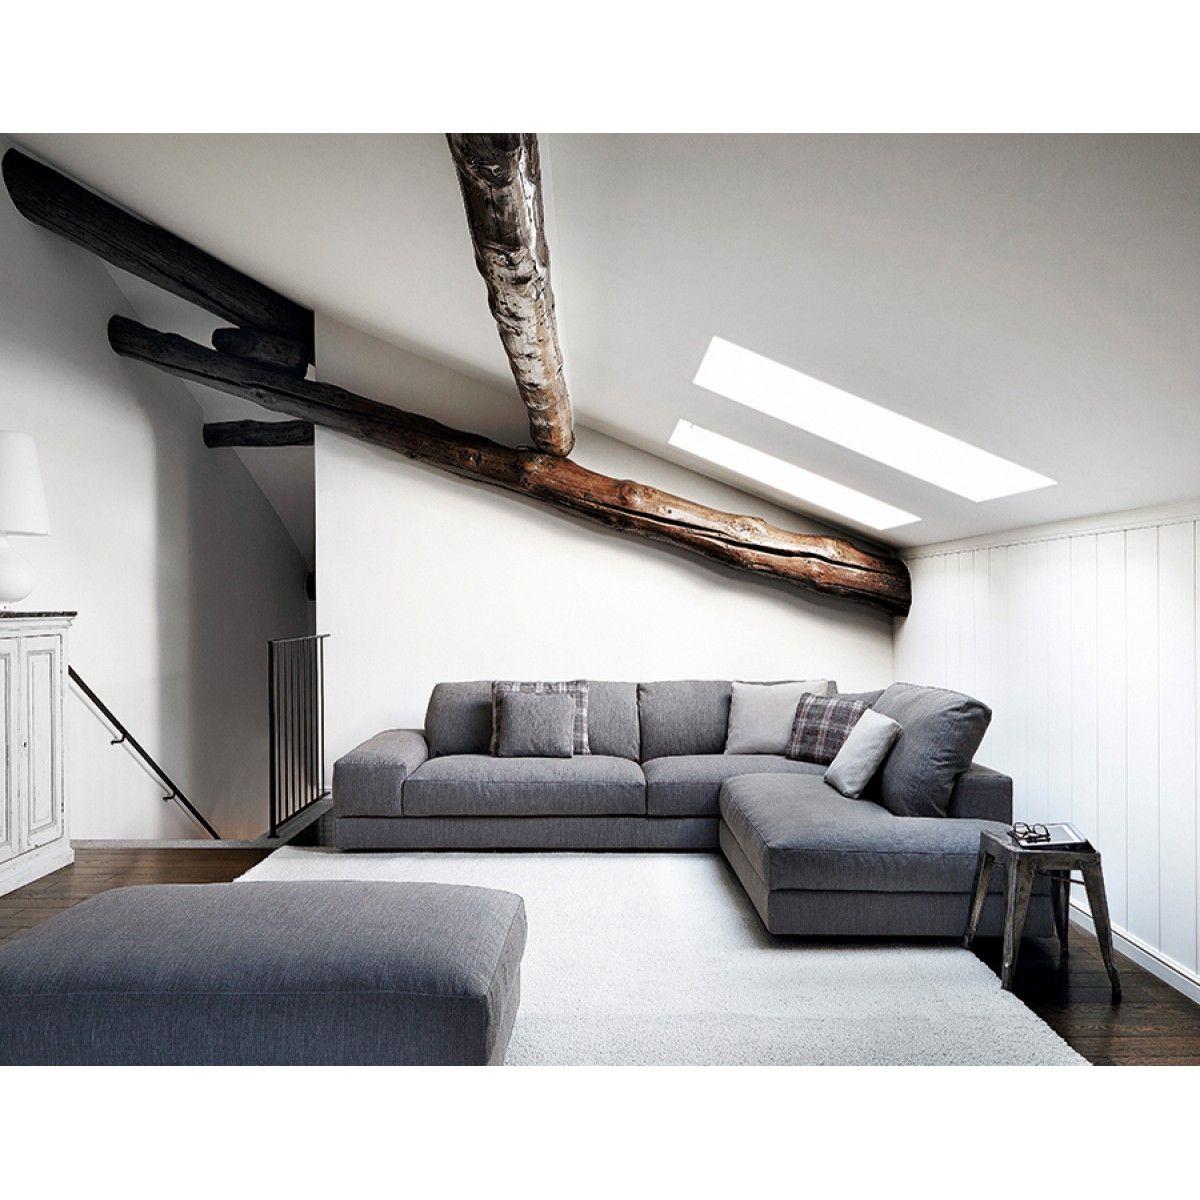 modern grey modular furniture. swan italia hamlet sofa very flexible and modern modular range which has ingenious grey furniture r